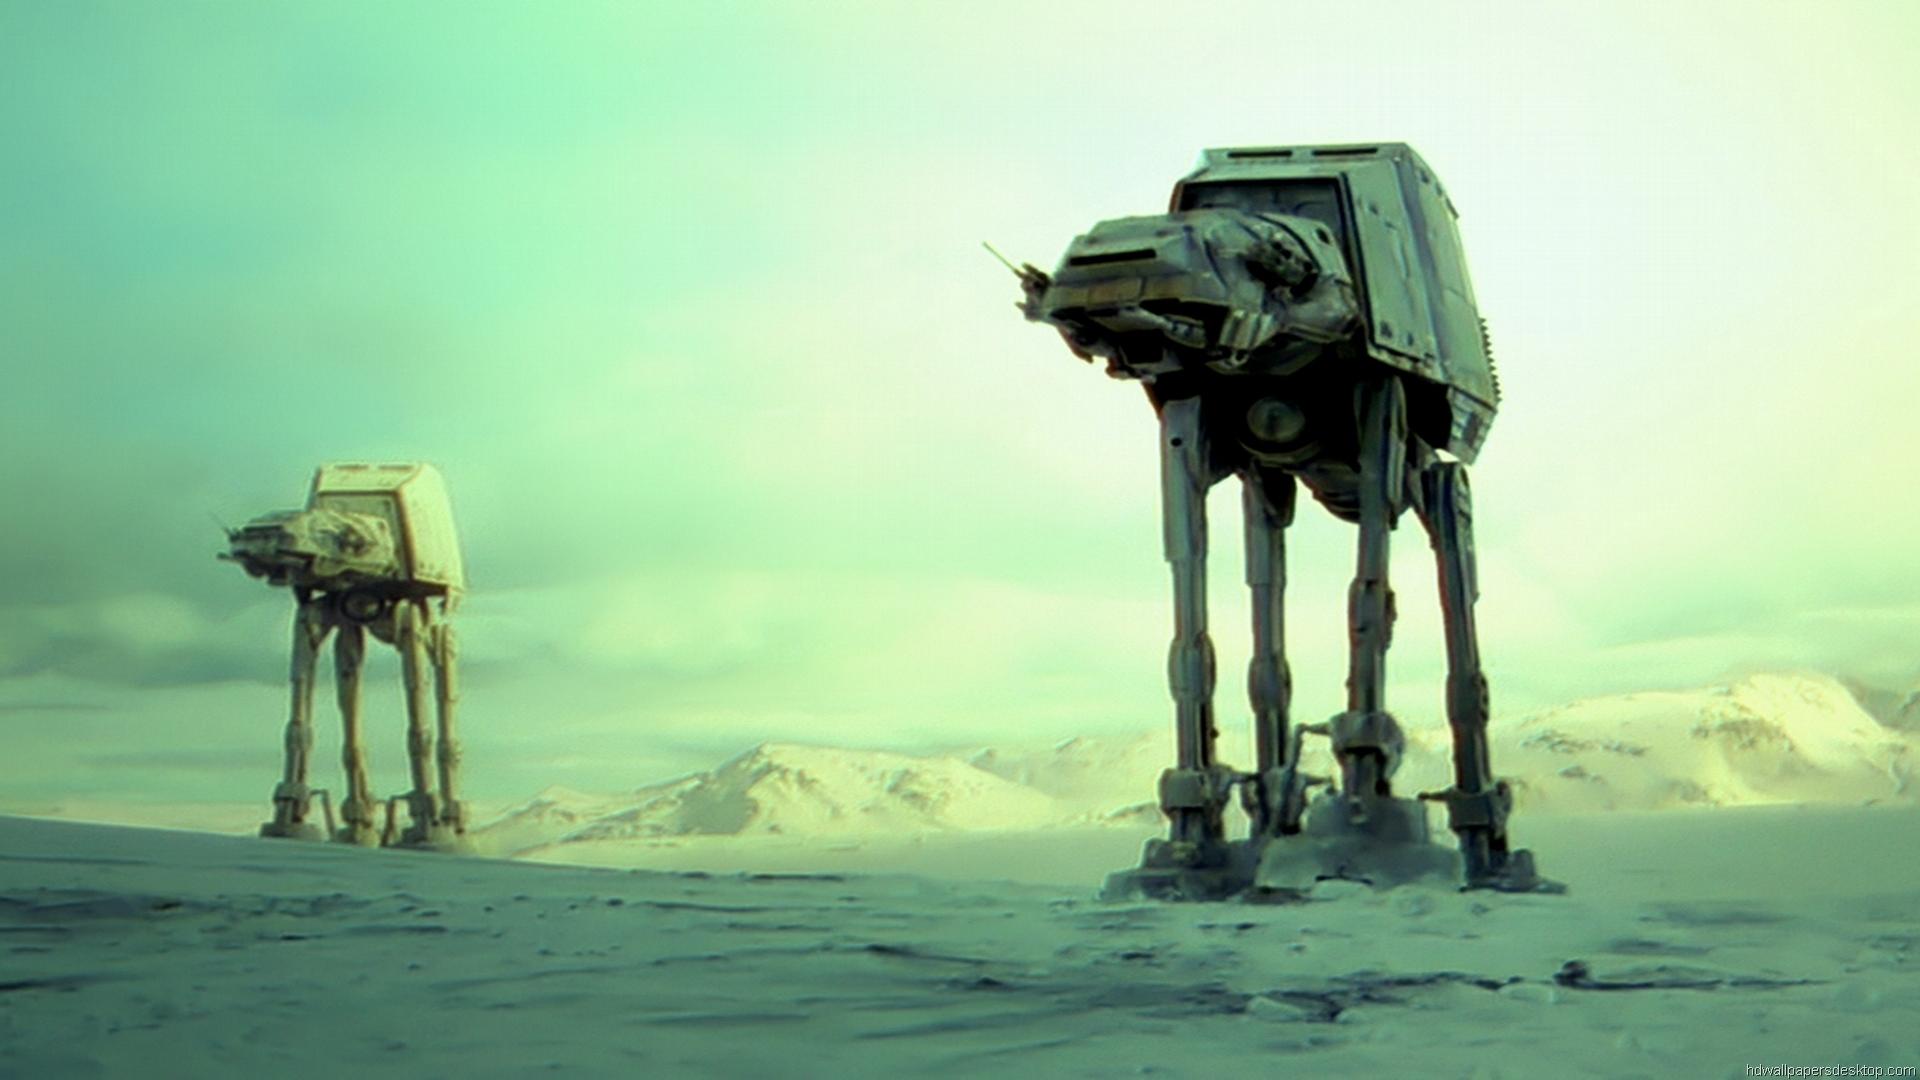 Star Wars Full HD Wallpaper 1080p Desktop starwars v imperial 1920x1080